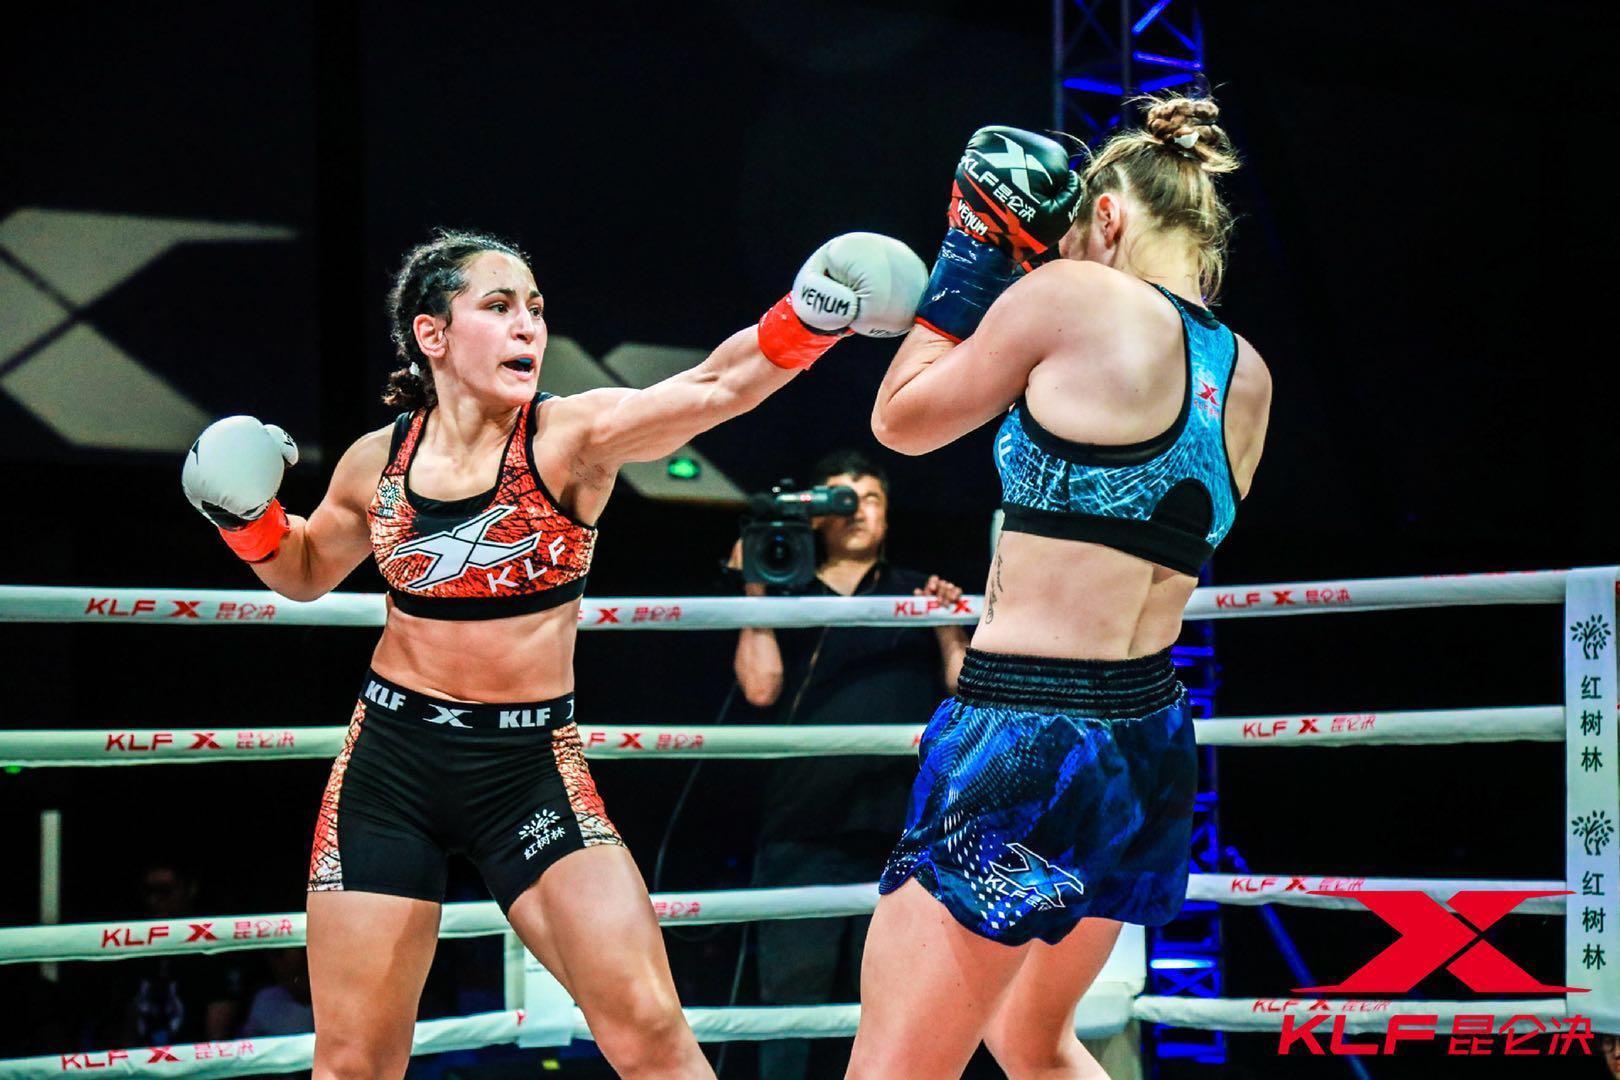 Kunlun Fight 73 results, Anissa Haddaoui def Anke Van Gestel via R3 Decision